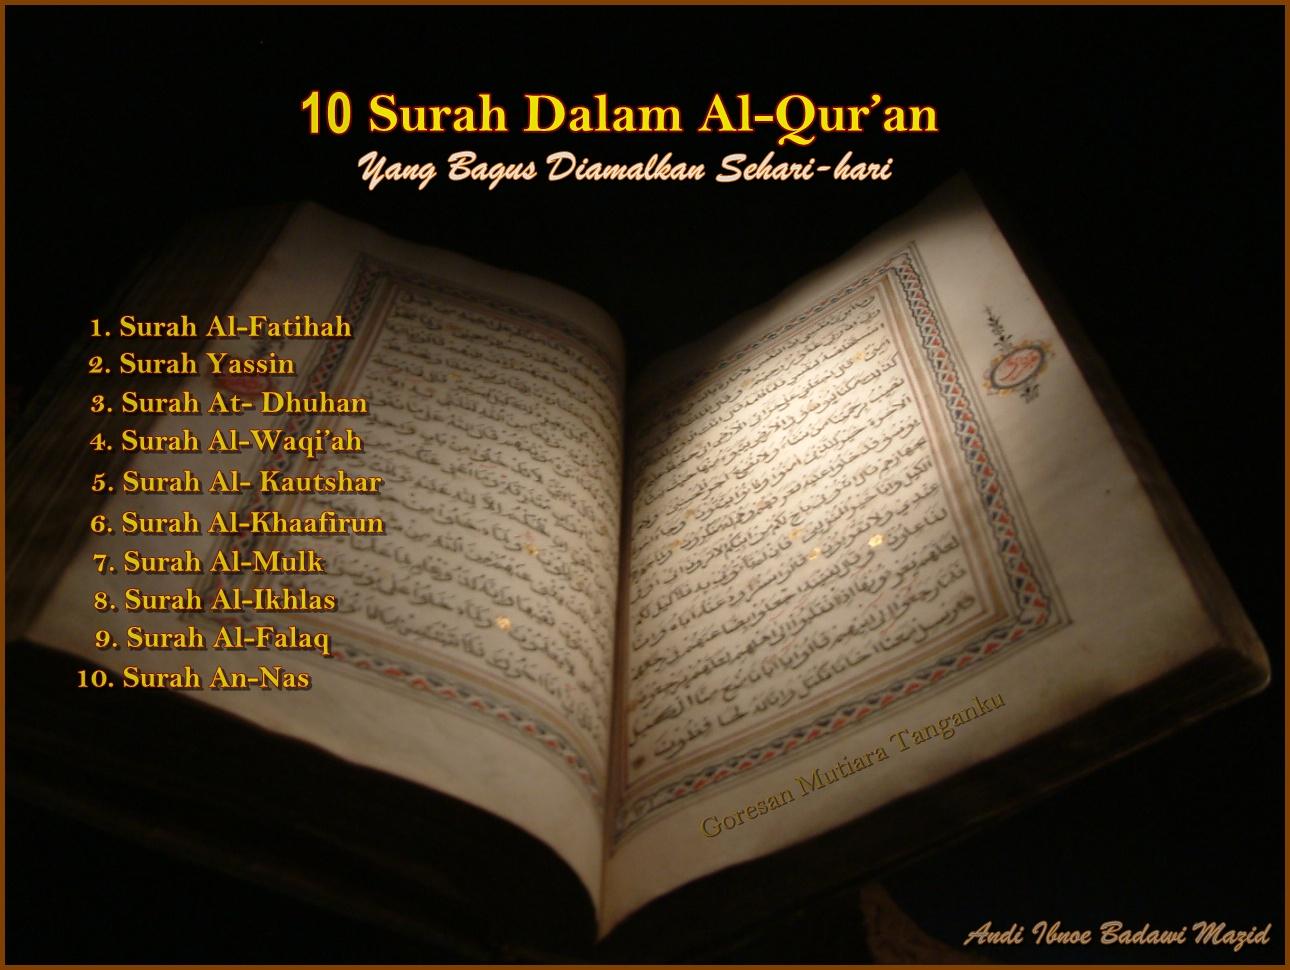 38 Kata Mutiara Al Quran 1000mutiarakata